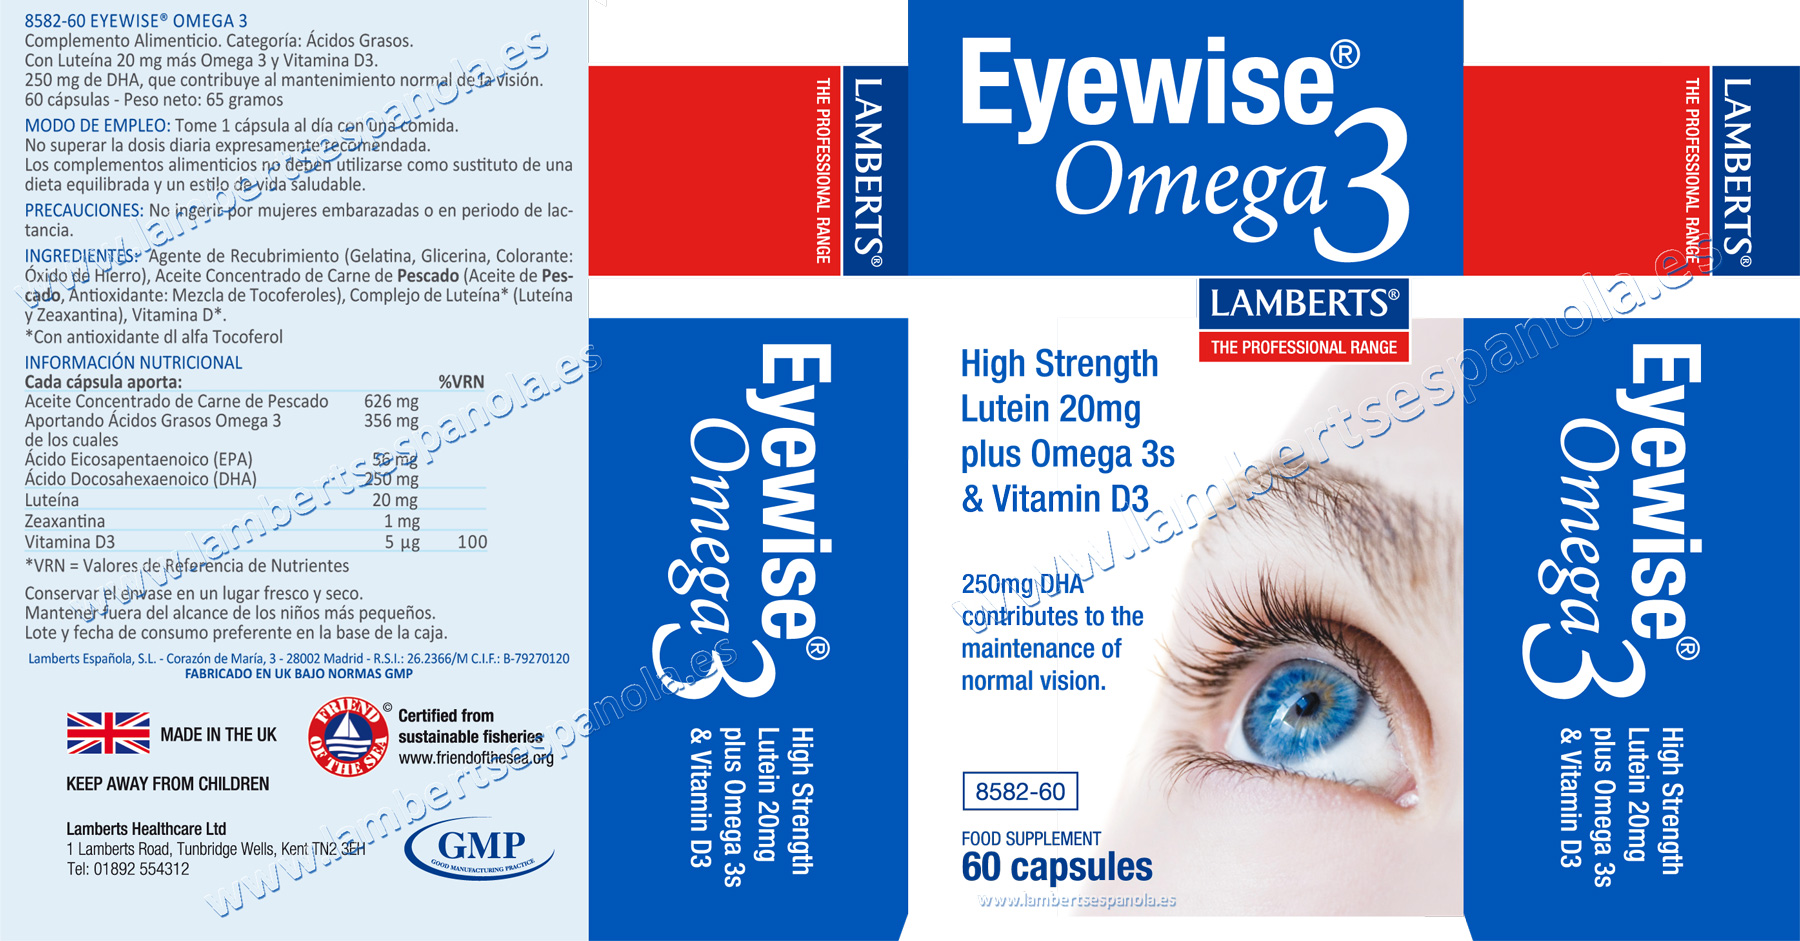 Eyewise con Omega 3 de Lamperts